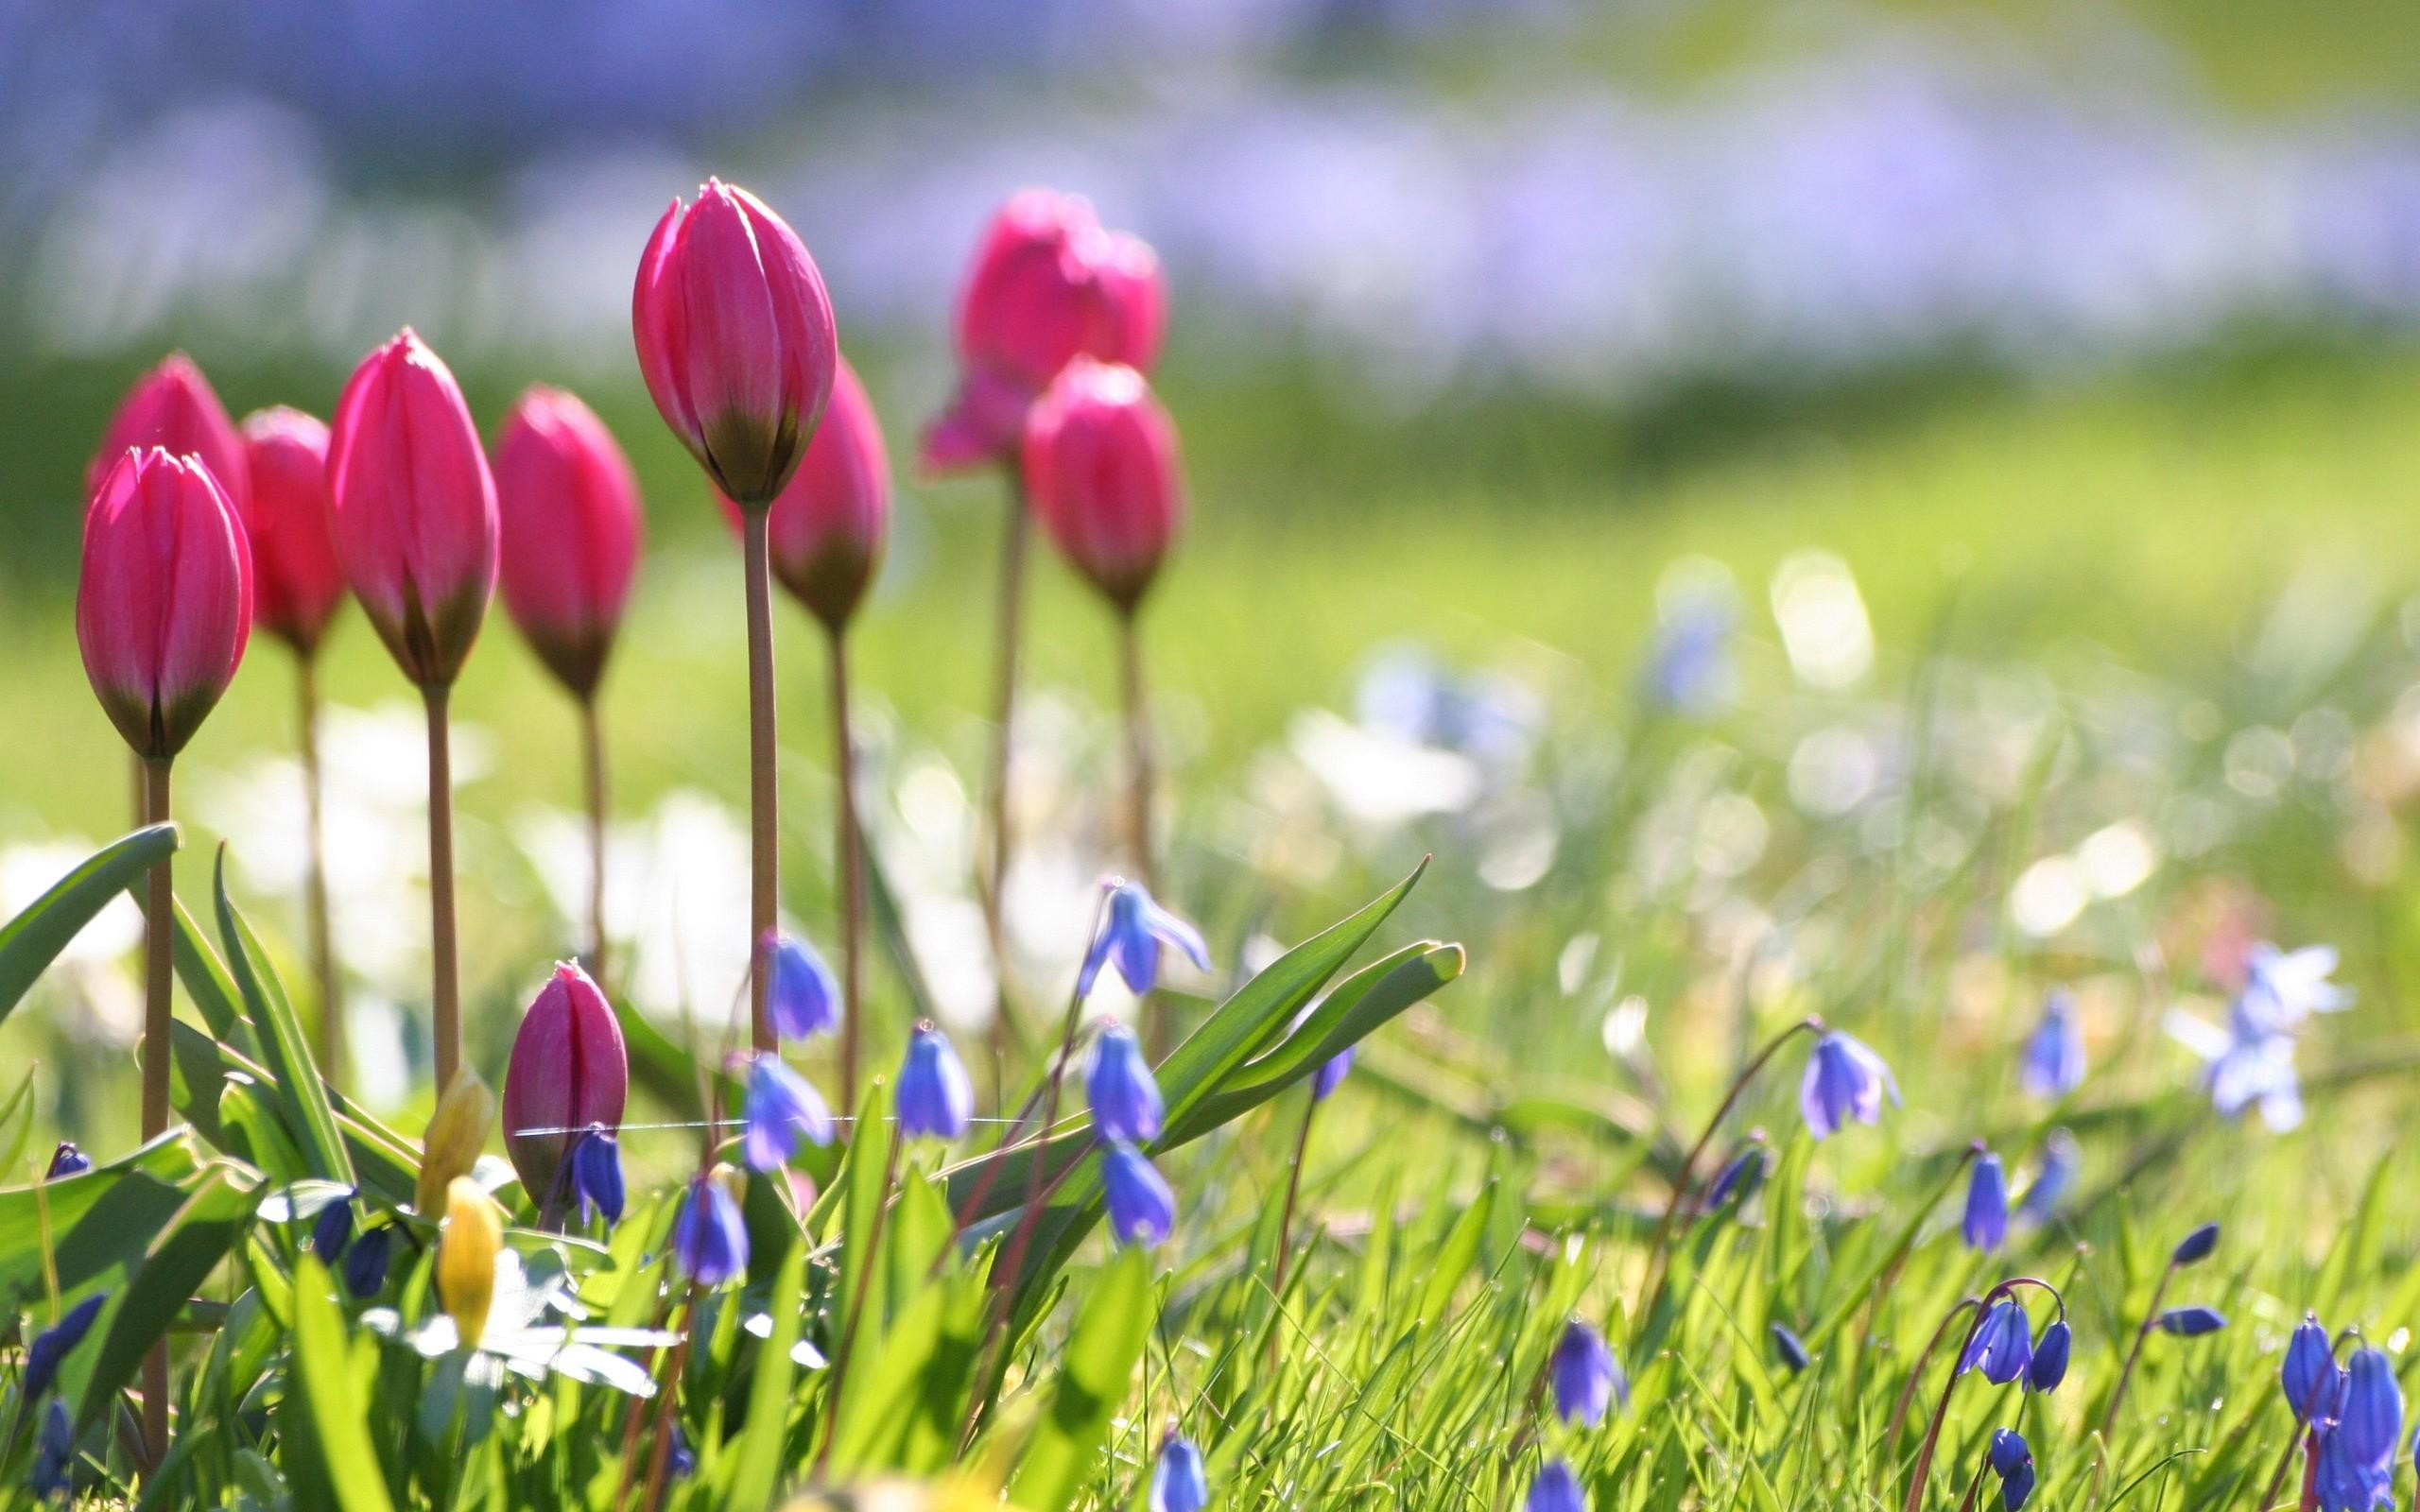 25+ best Spring flowers wallpaper ideas on Pinterest | Golden retriever  labrador, Puppy flowers and Cute puppy pics